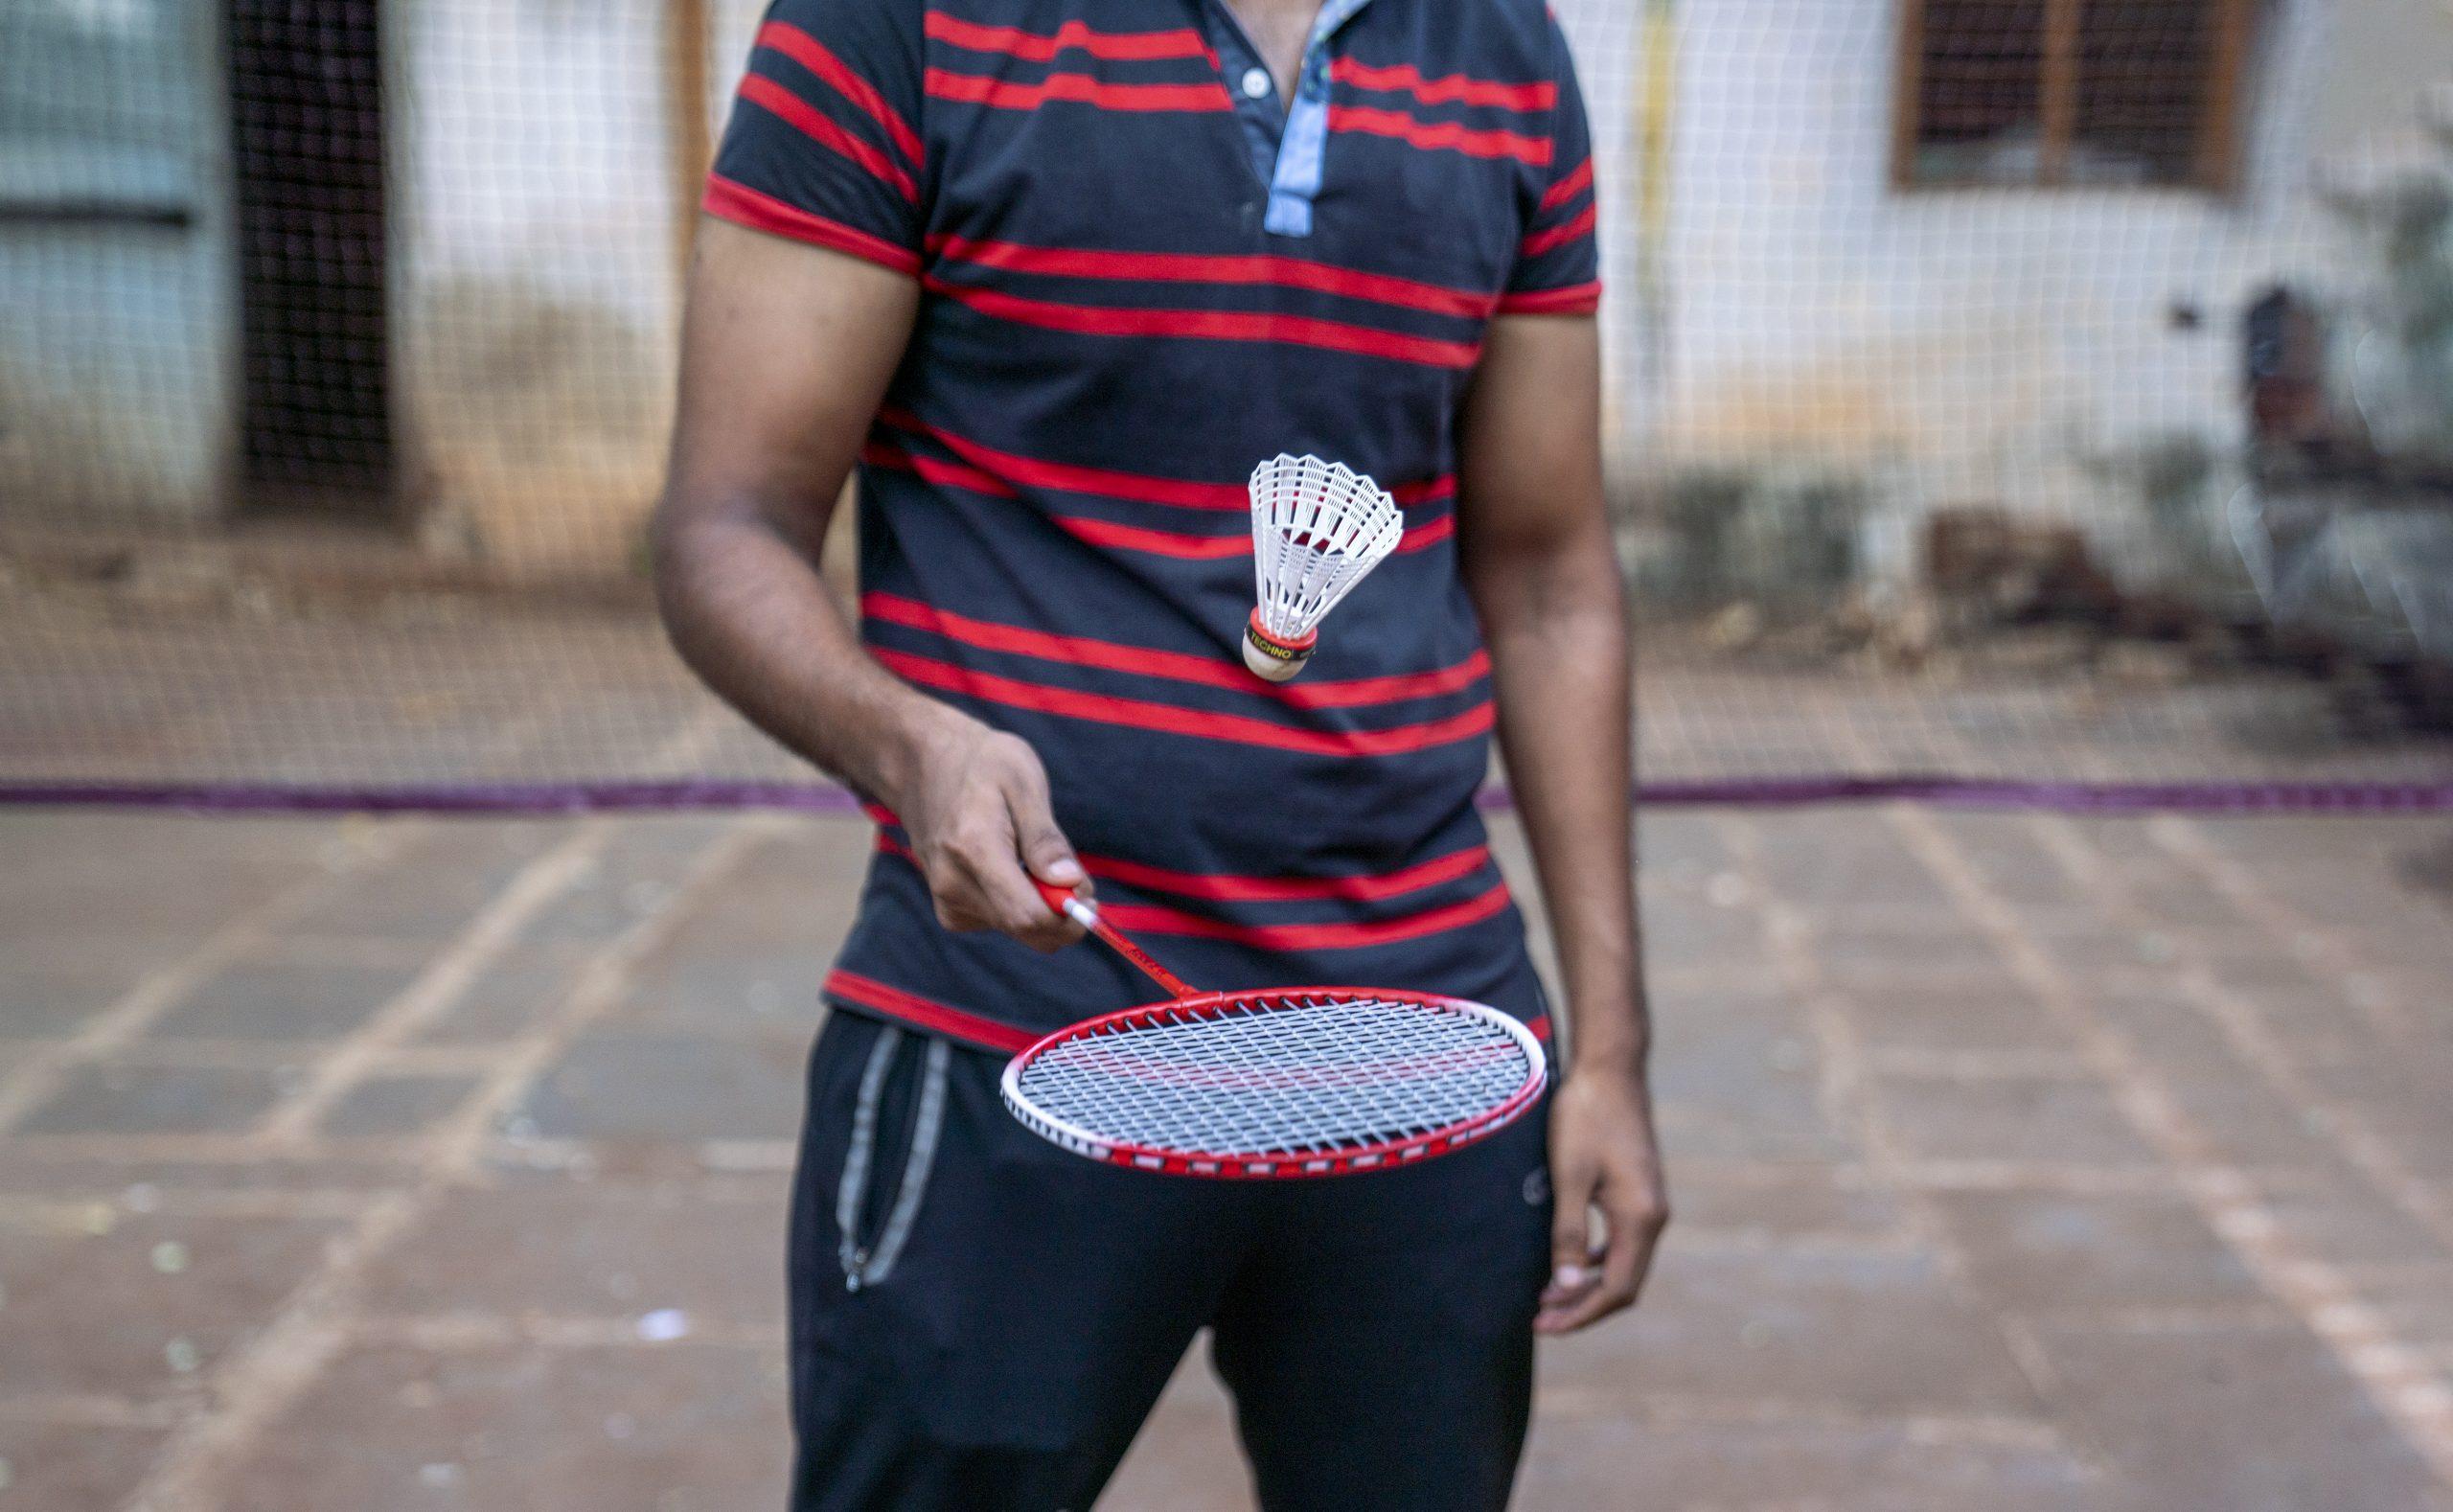 Man holding badminton racket